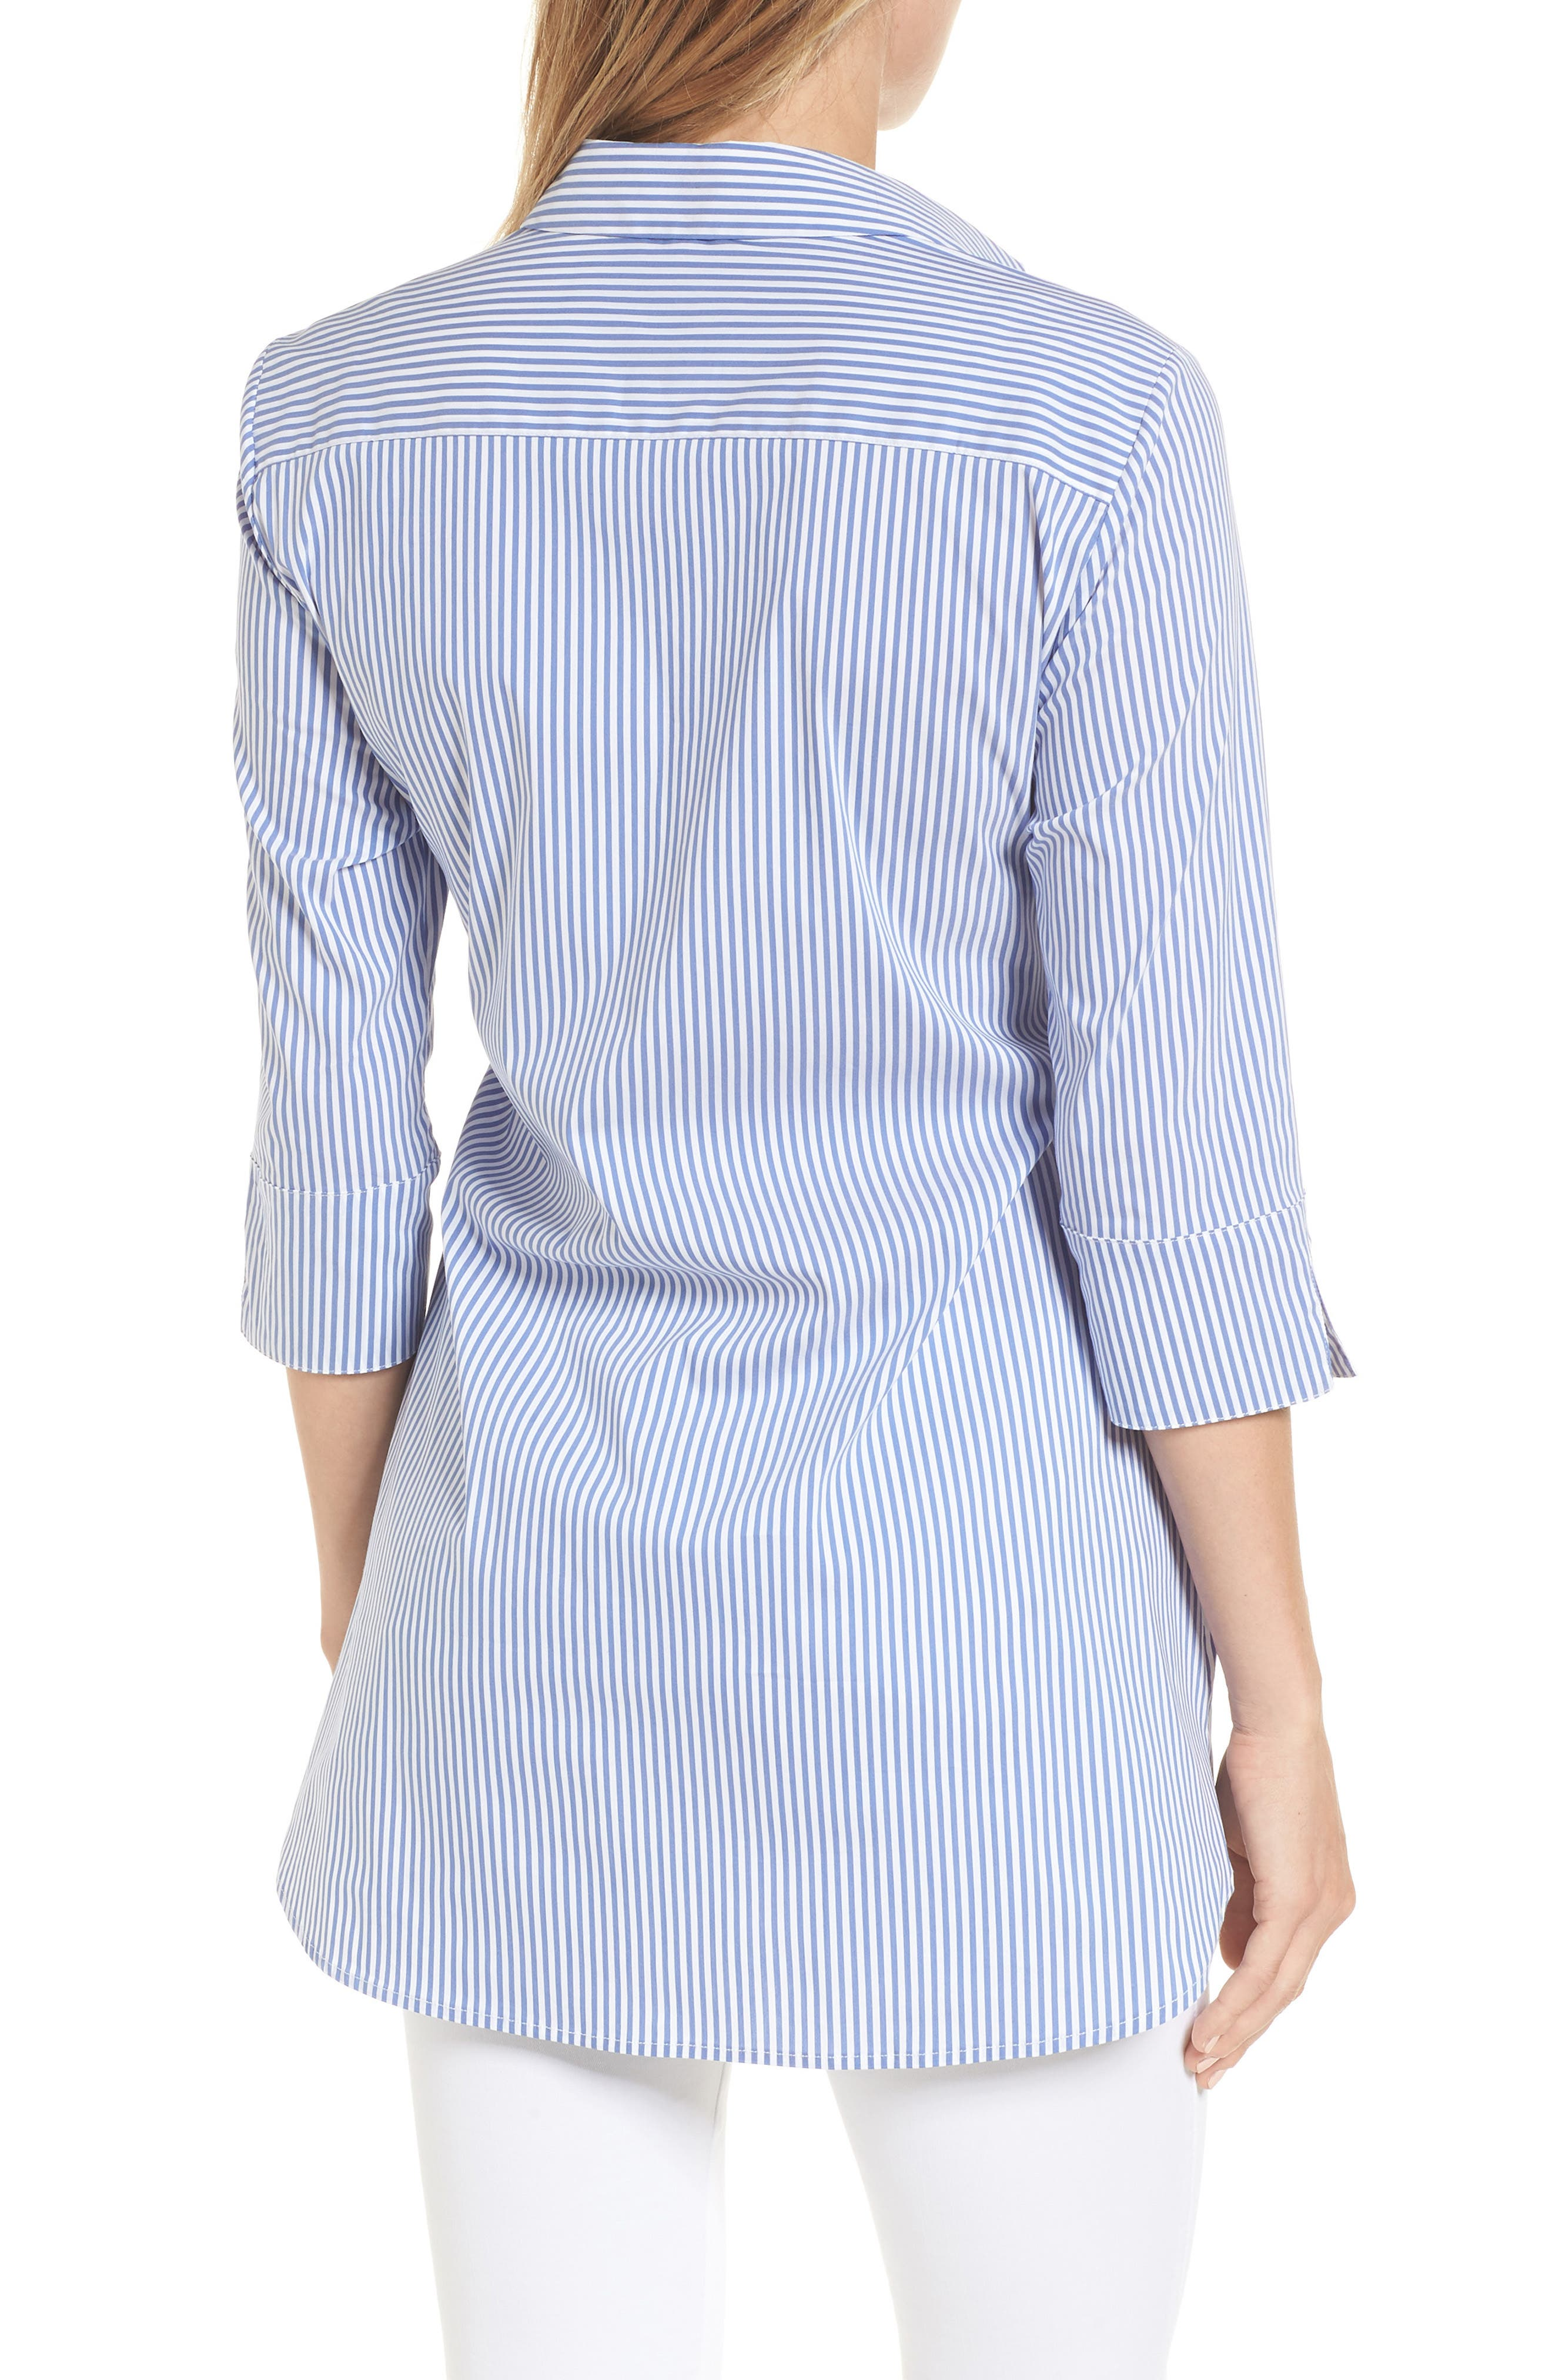 Dora Tie Front Maternity Shirt,                             Alternate thumbnail 5, color,                             Blue/White Stripe